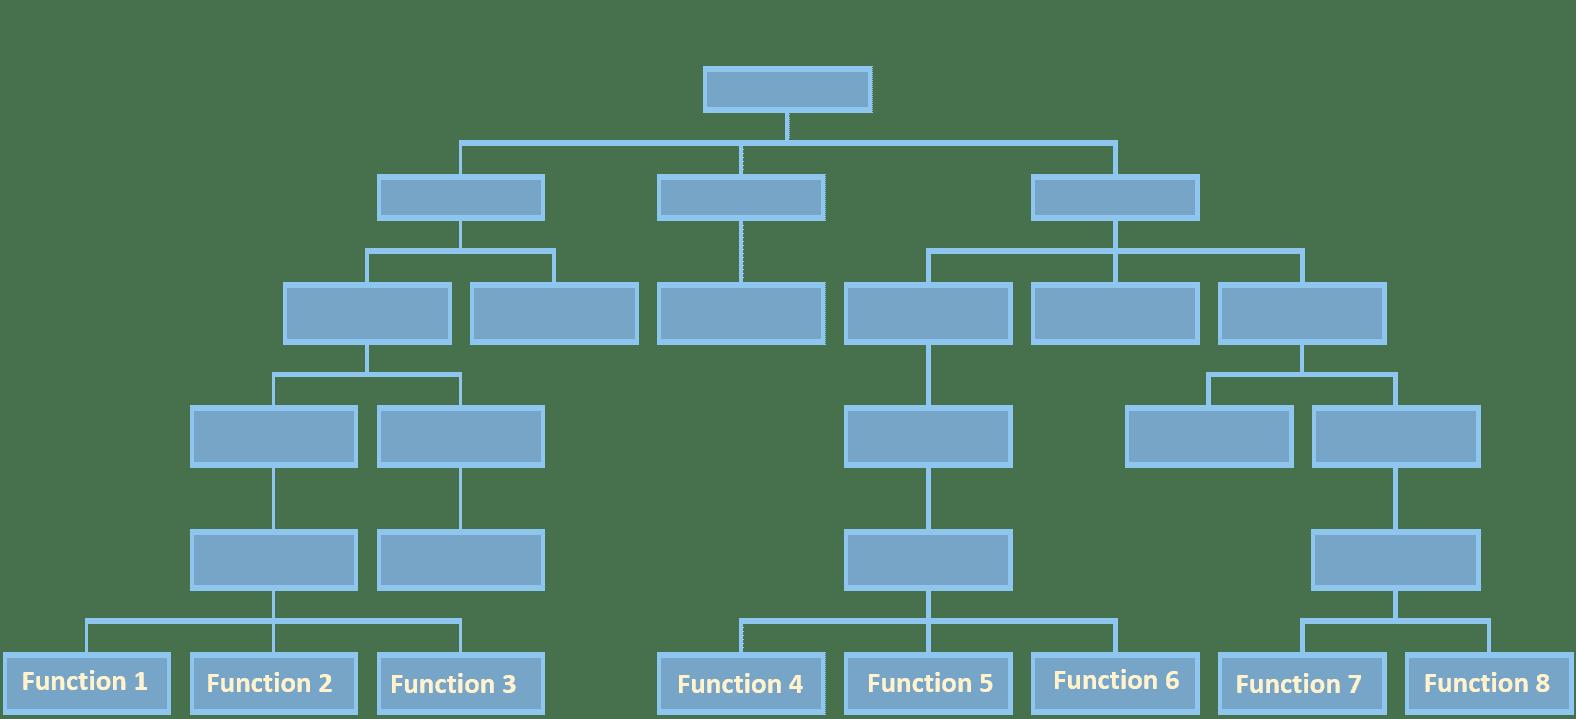 Hierarchical organization chart- Process Analysis